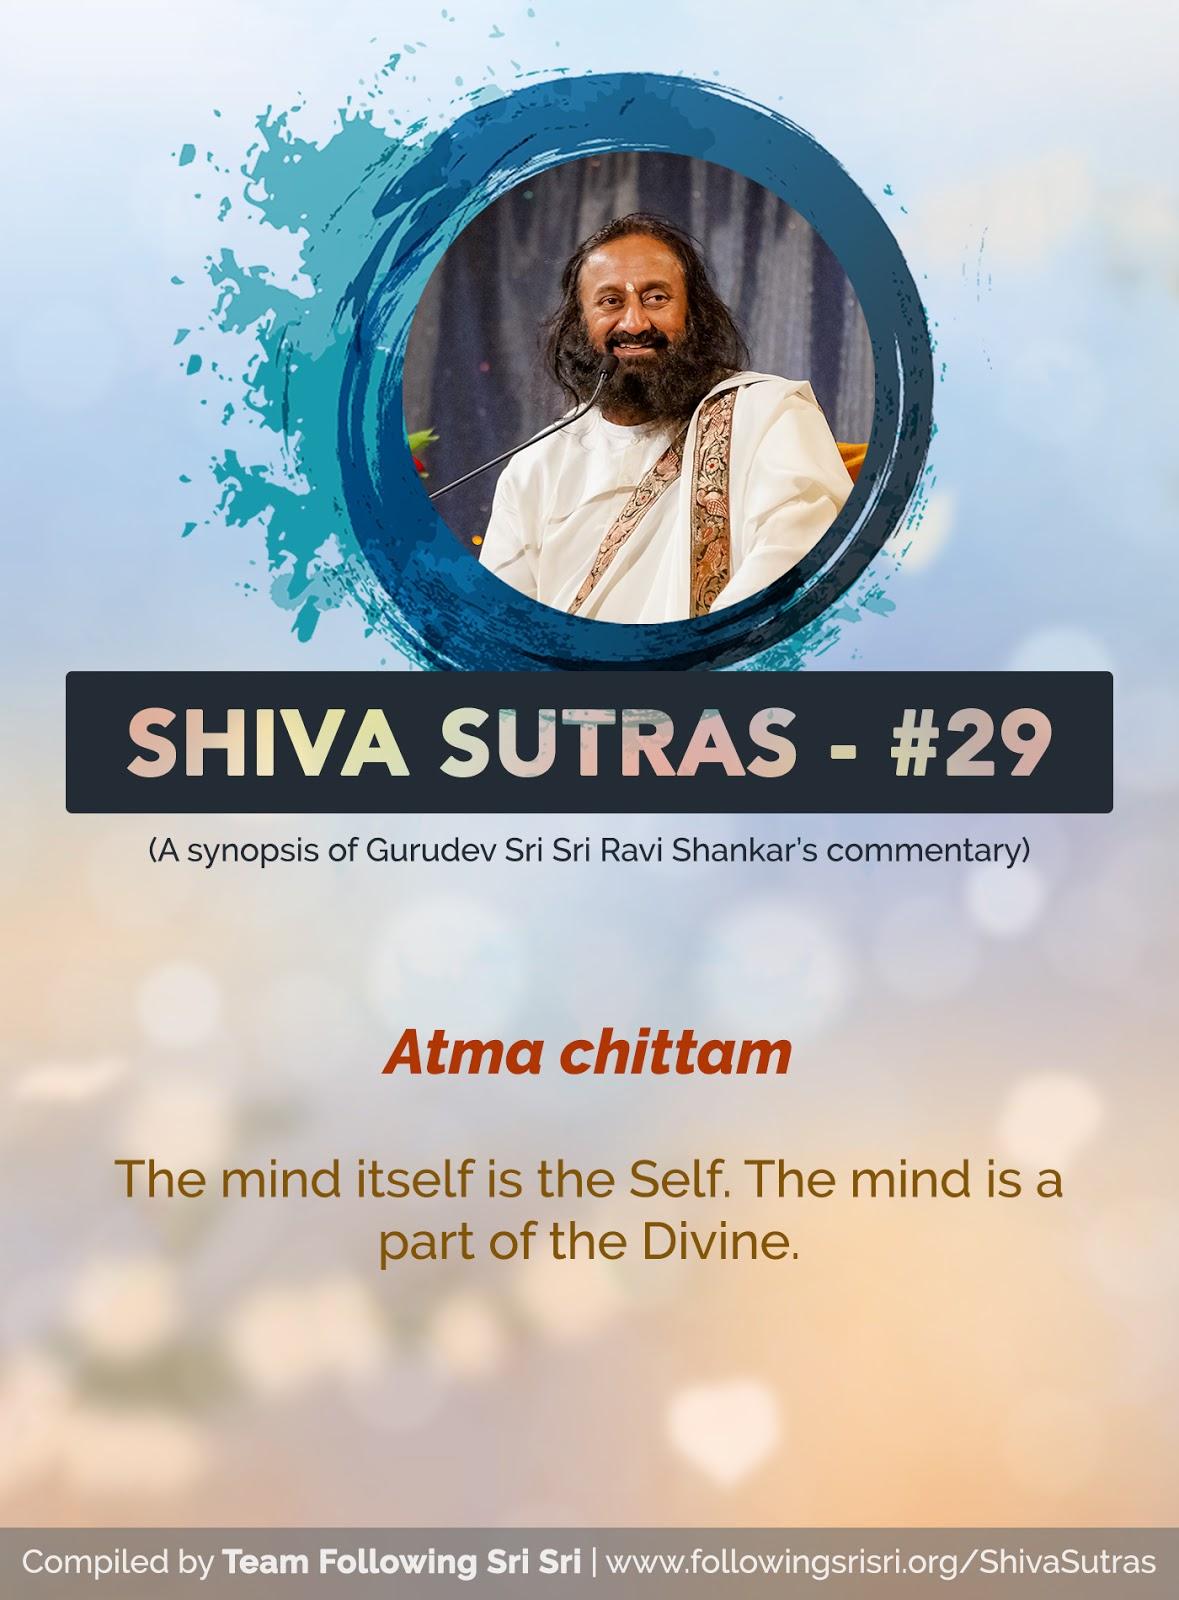 Shiva Sutras - Sutra 29